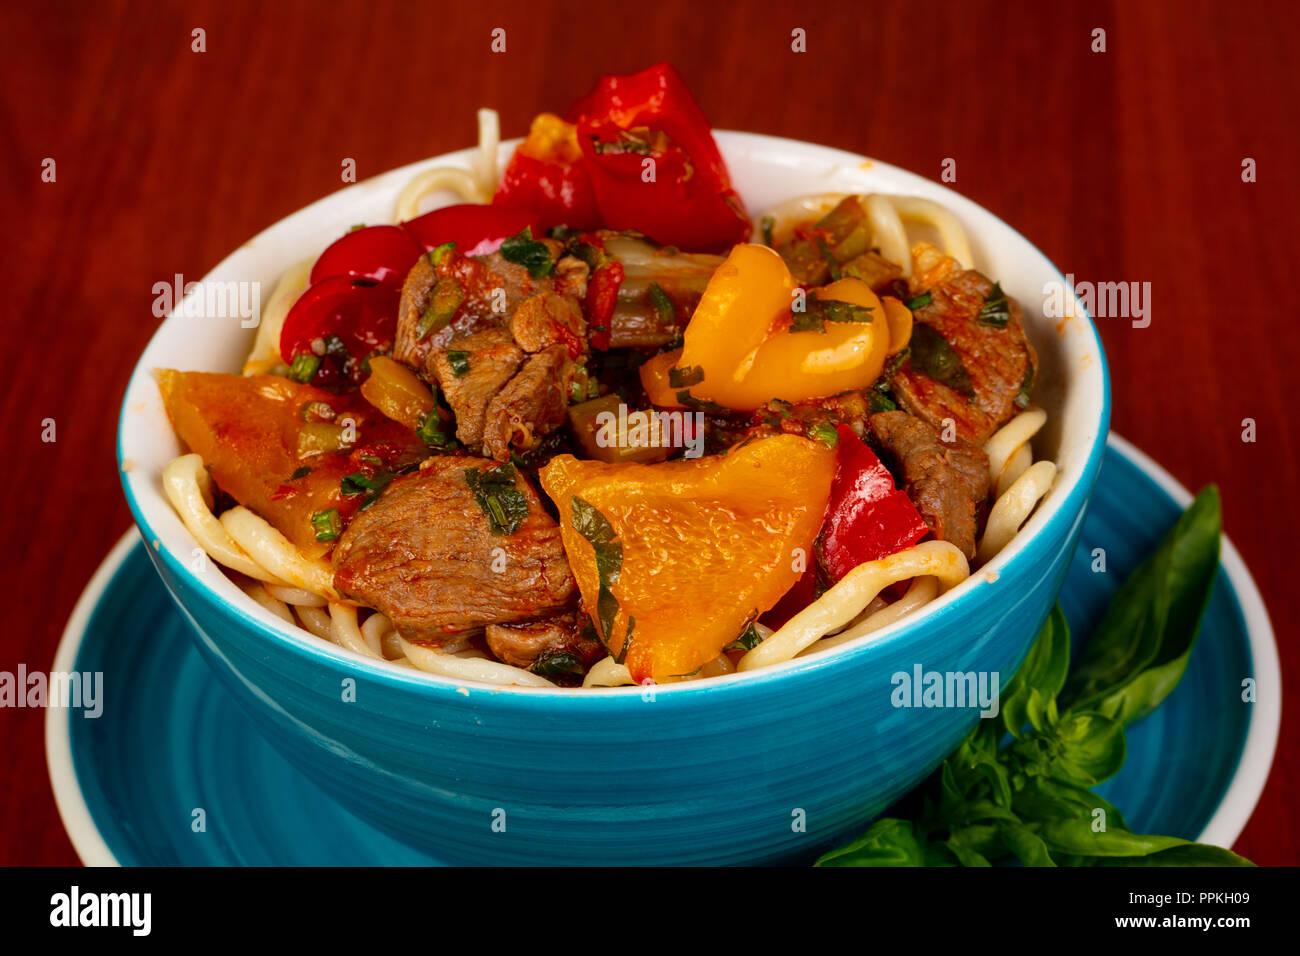 Usbek cuisine - lagman  with meat Stock Photo